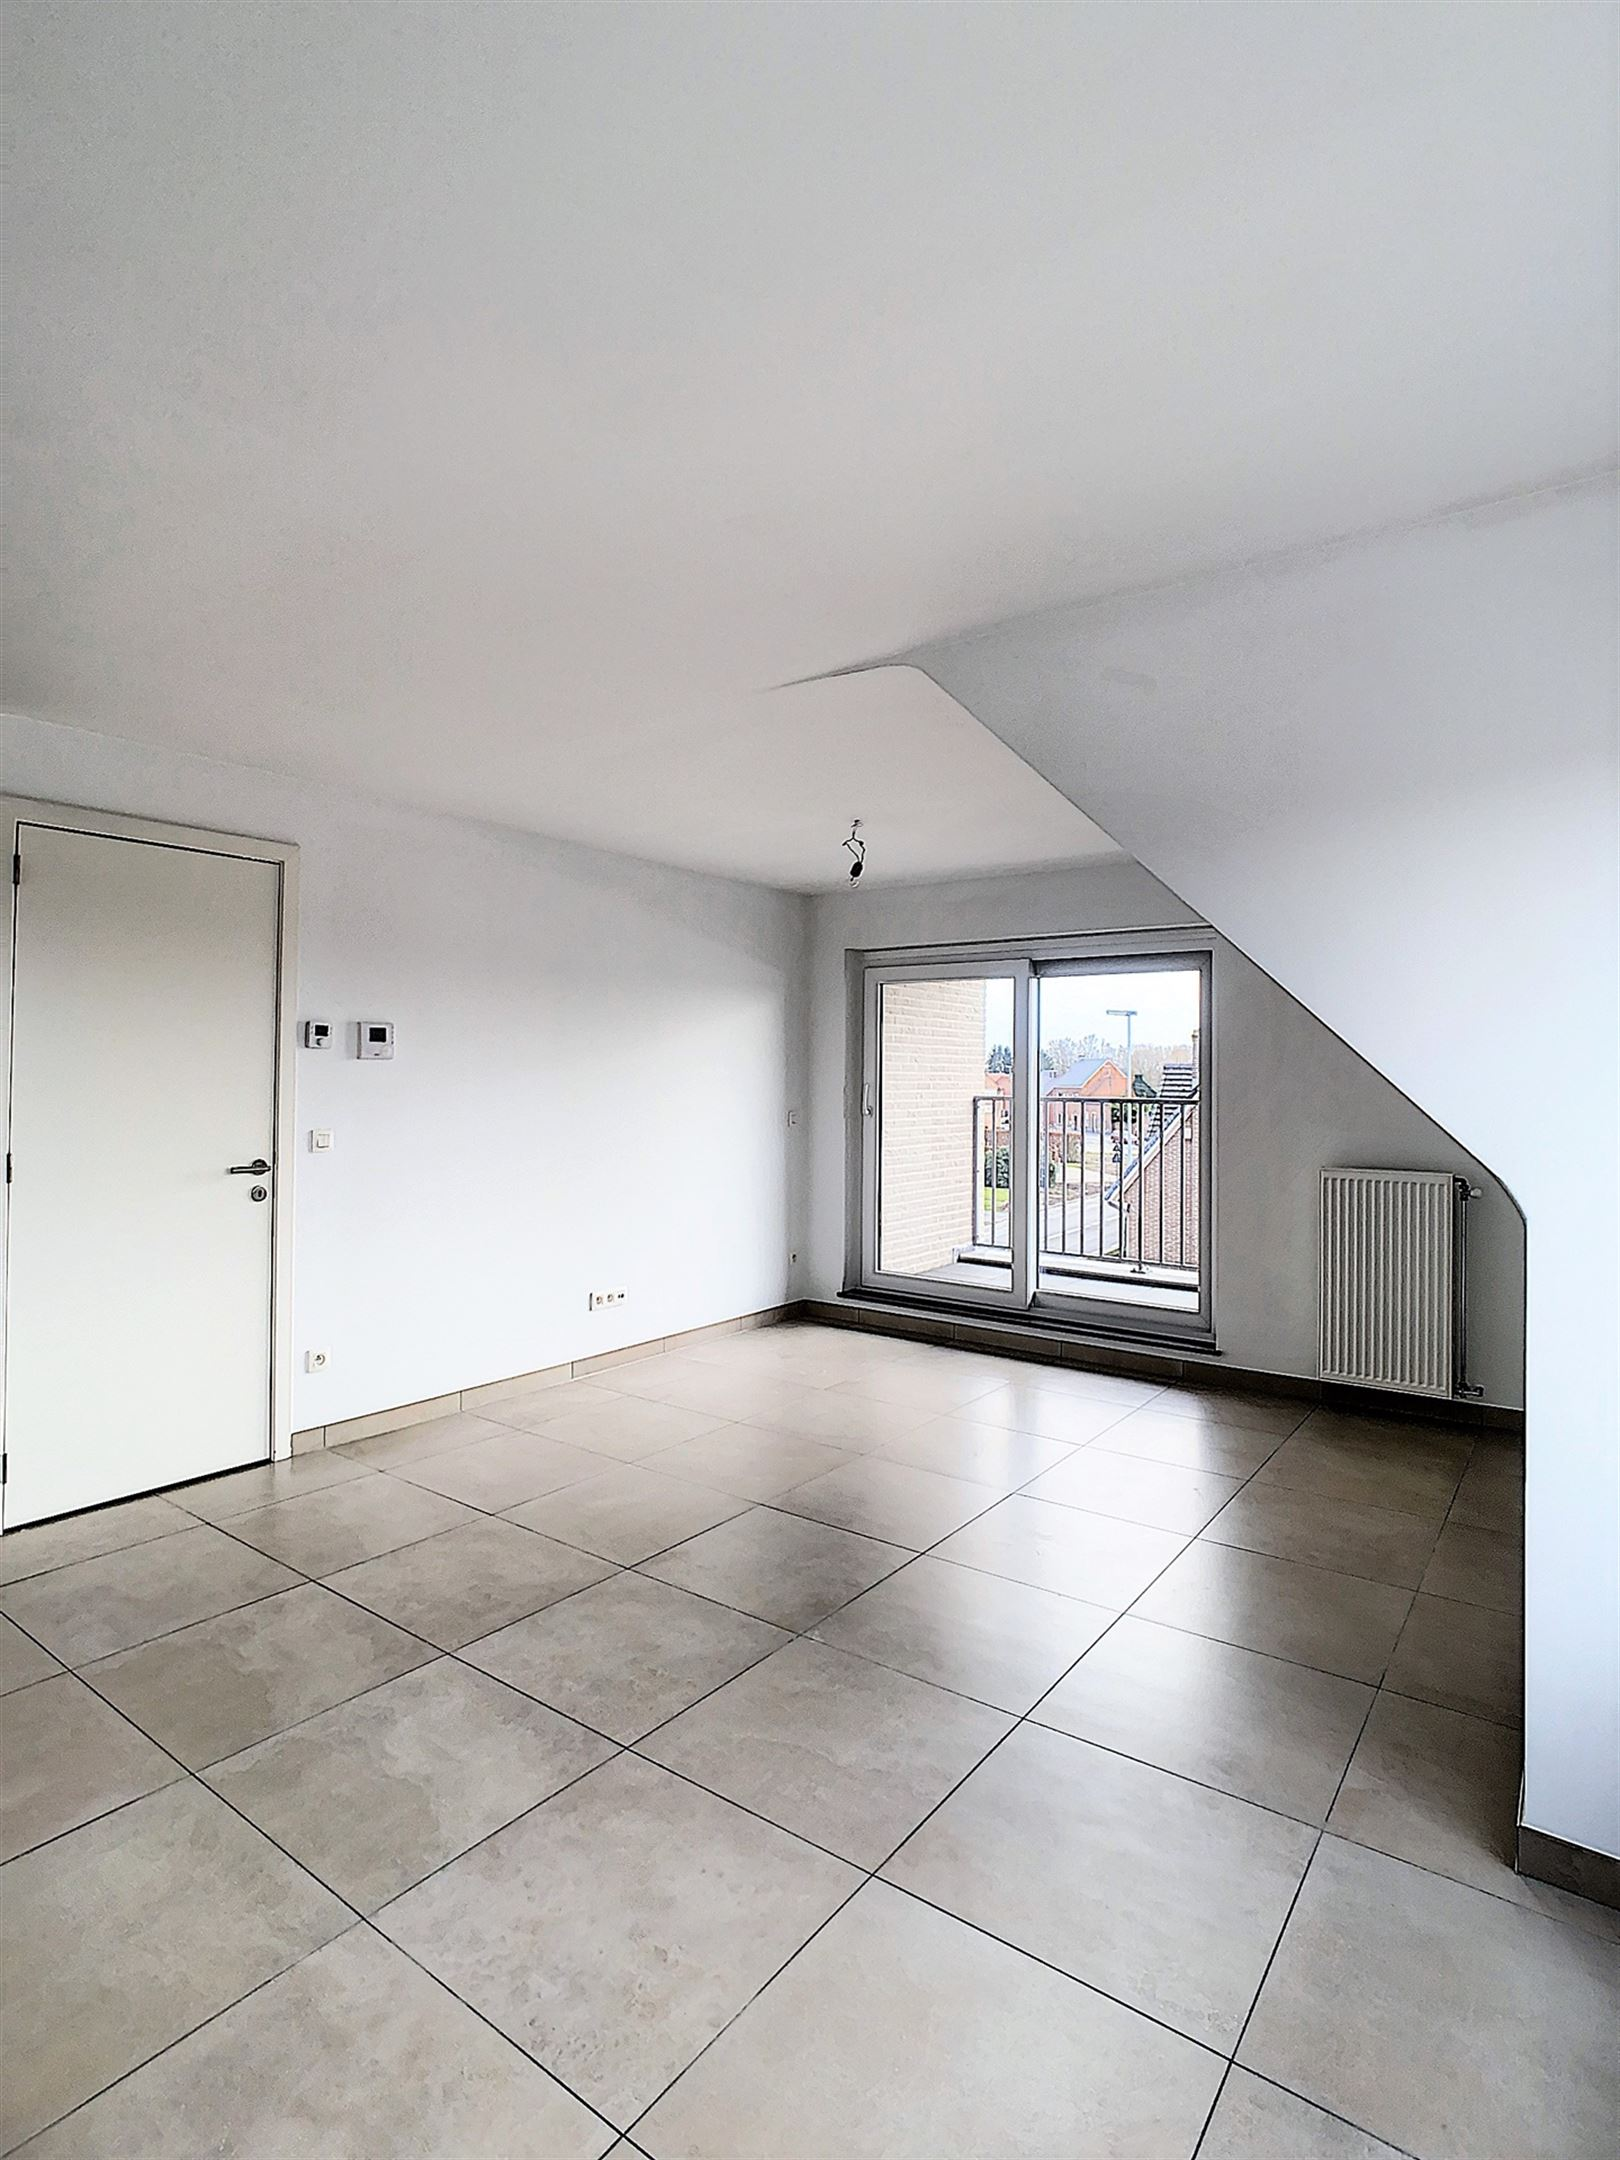 Foto 5 : Appartement te 9220 HAMME (België) - Prijs € 675